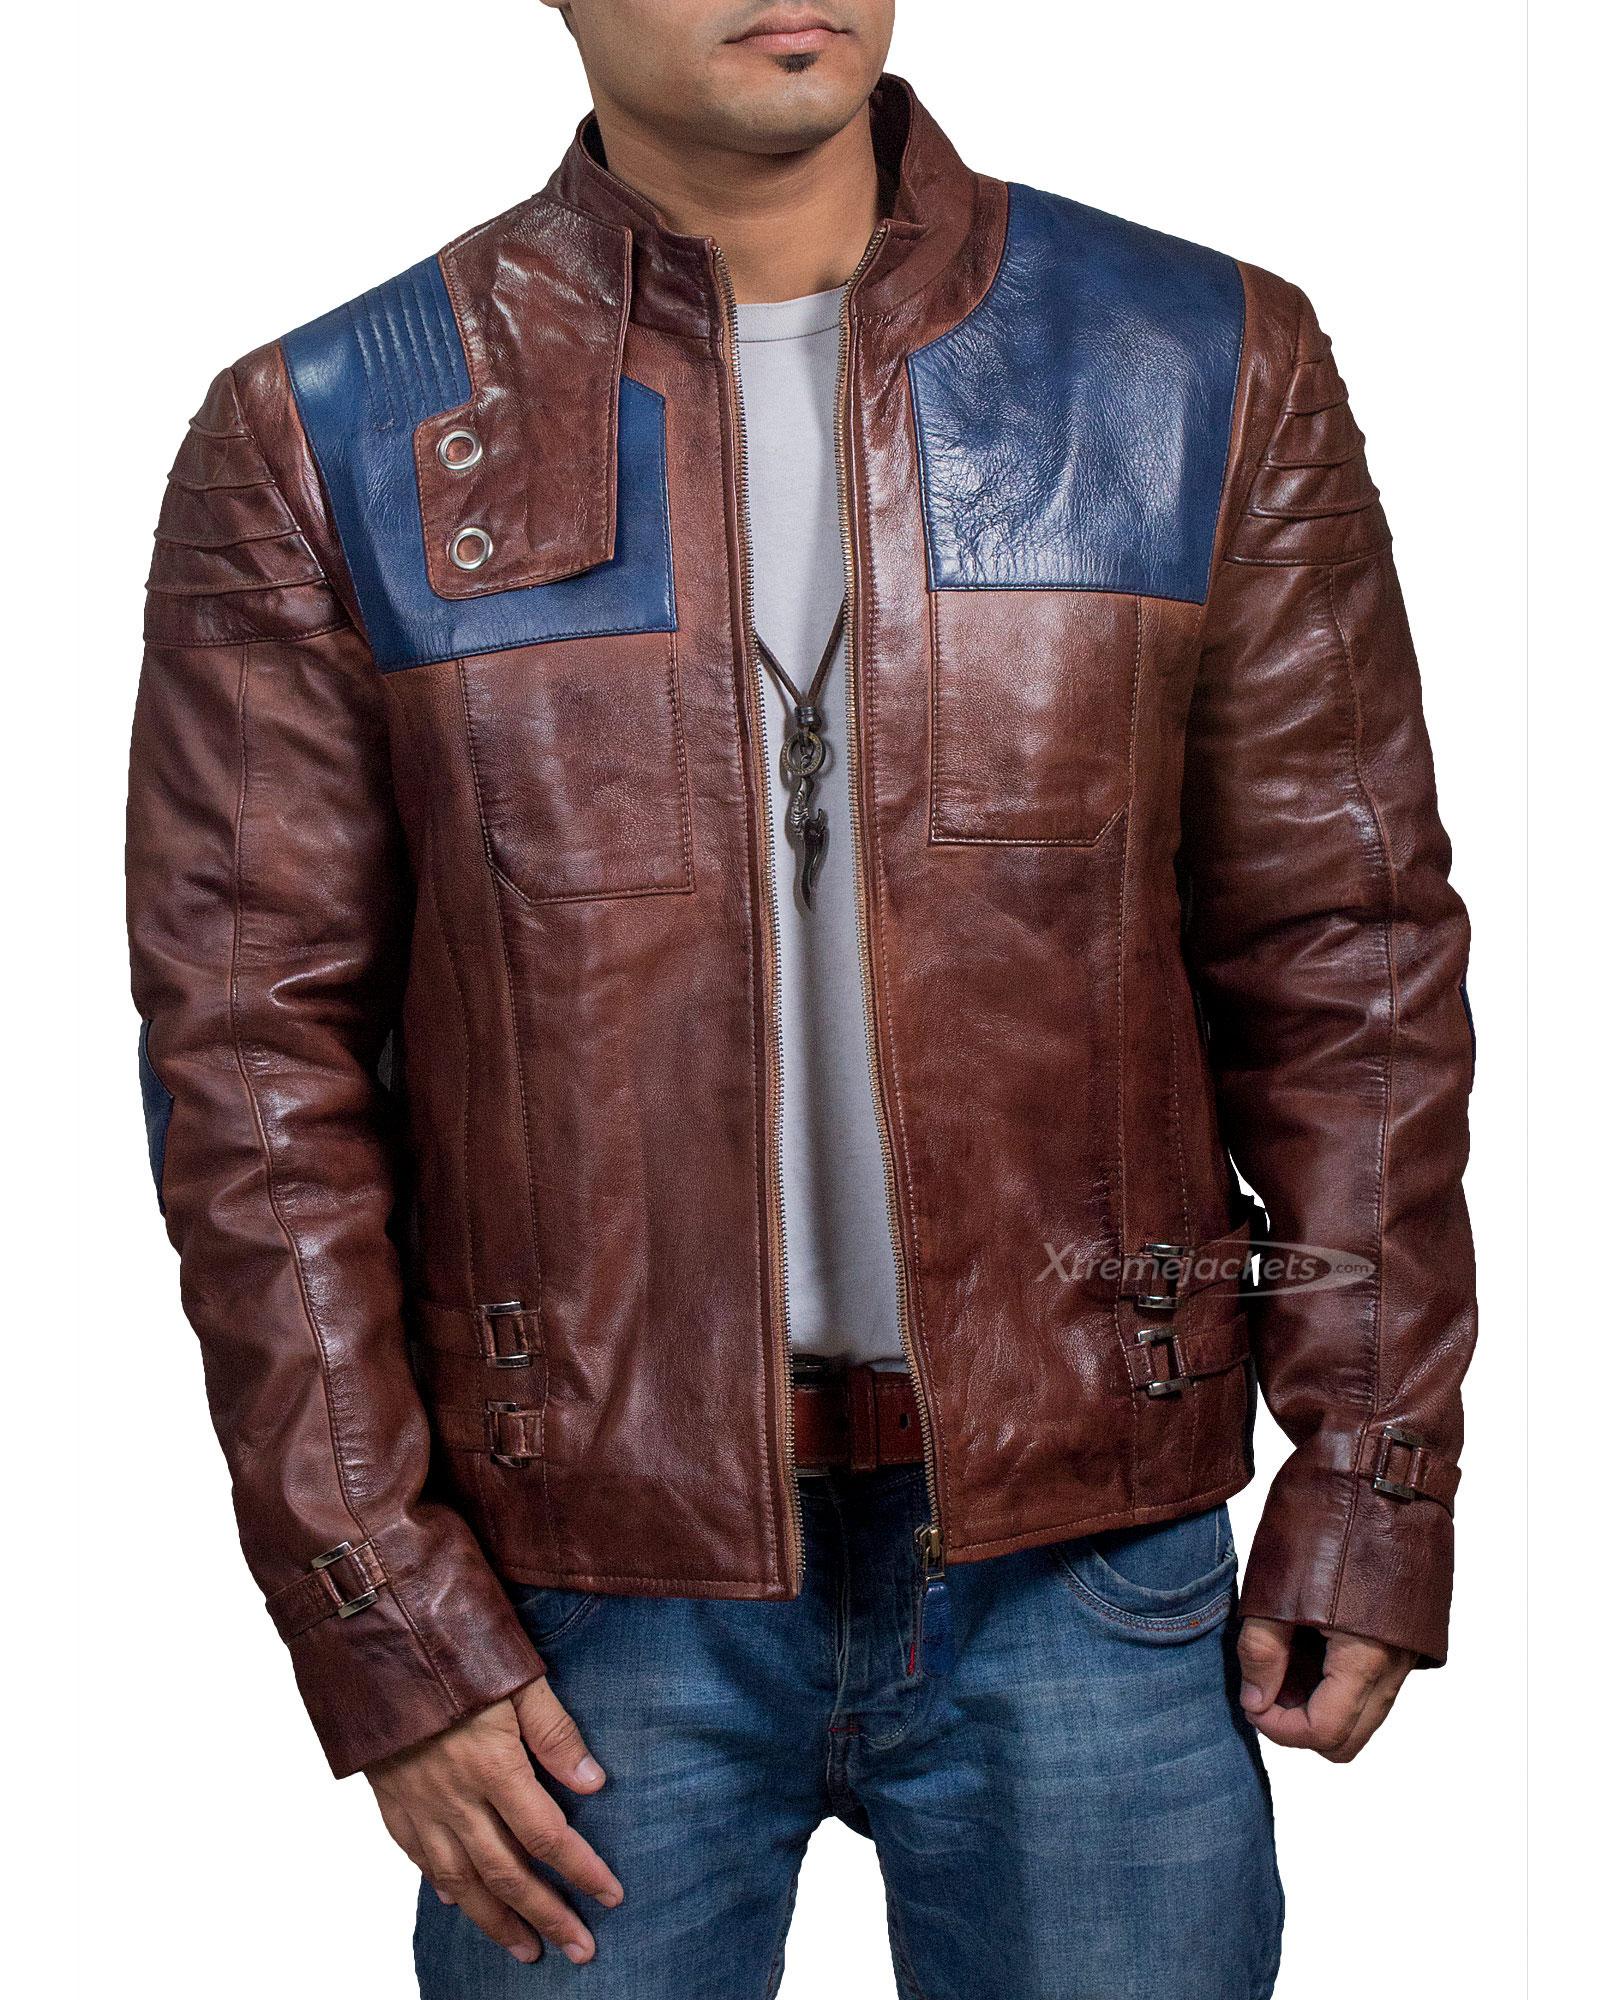 krypton-seg-el-jacket-b